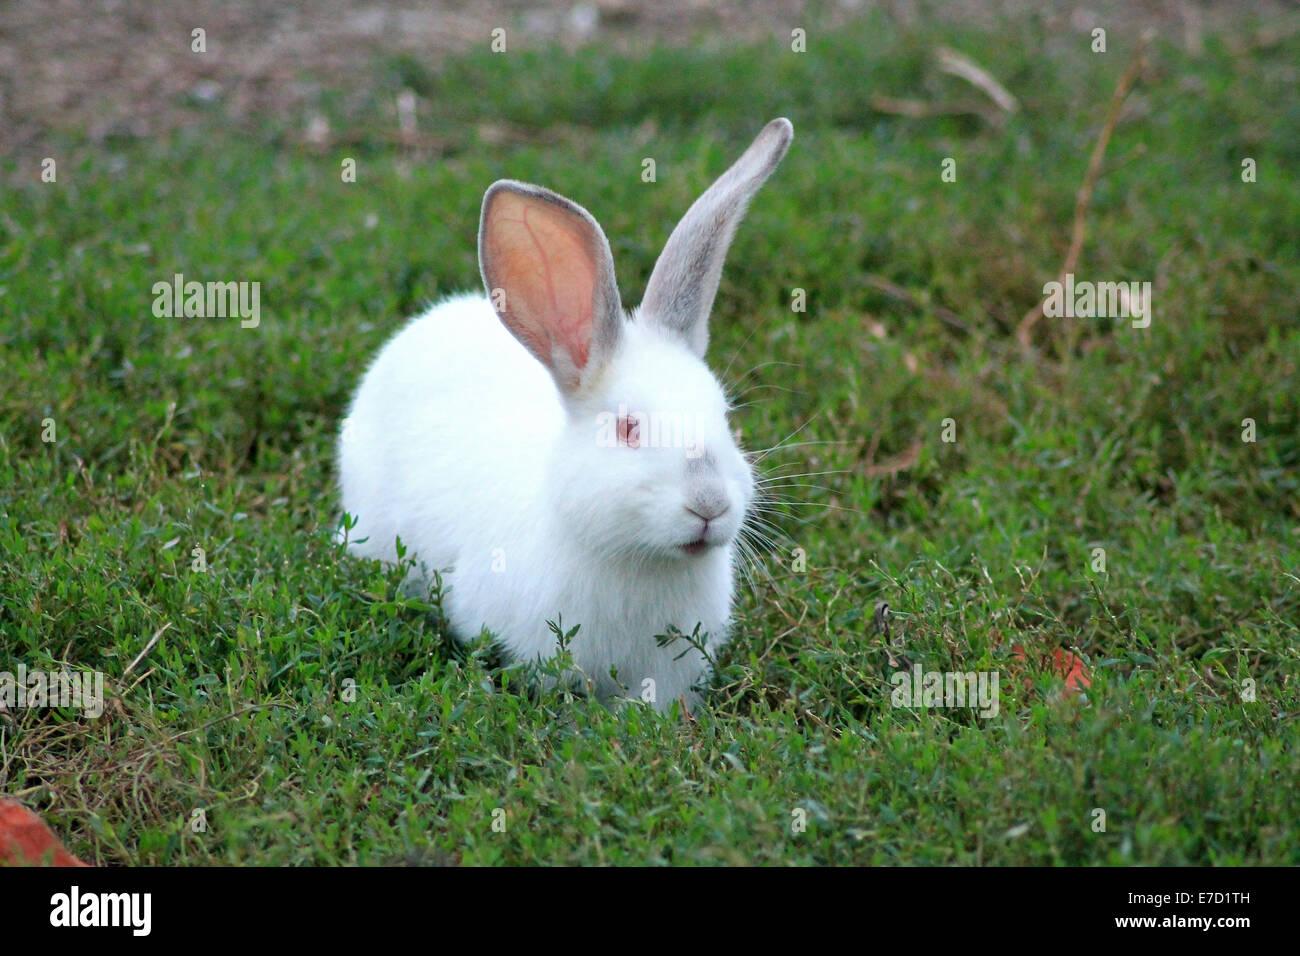 White rabbit - Stock Image